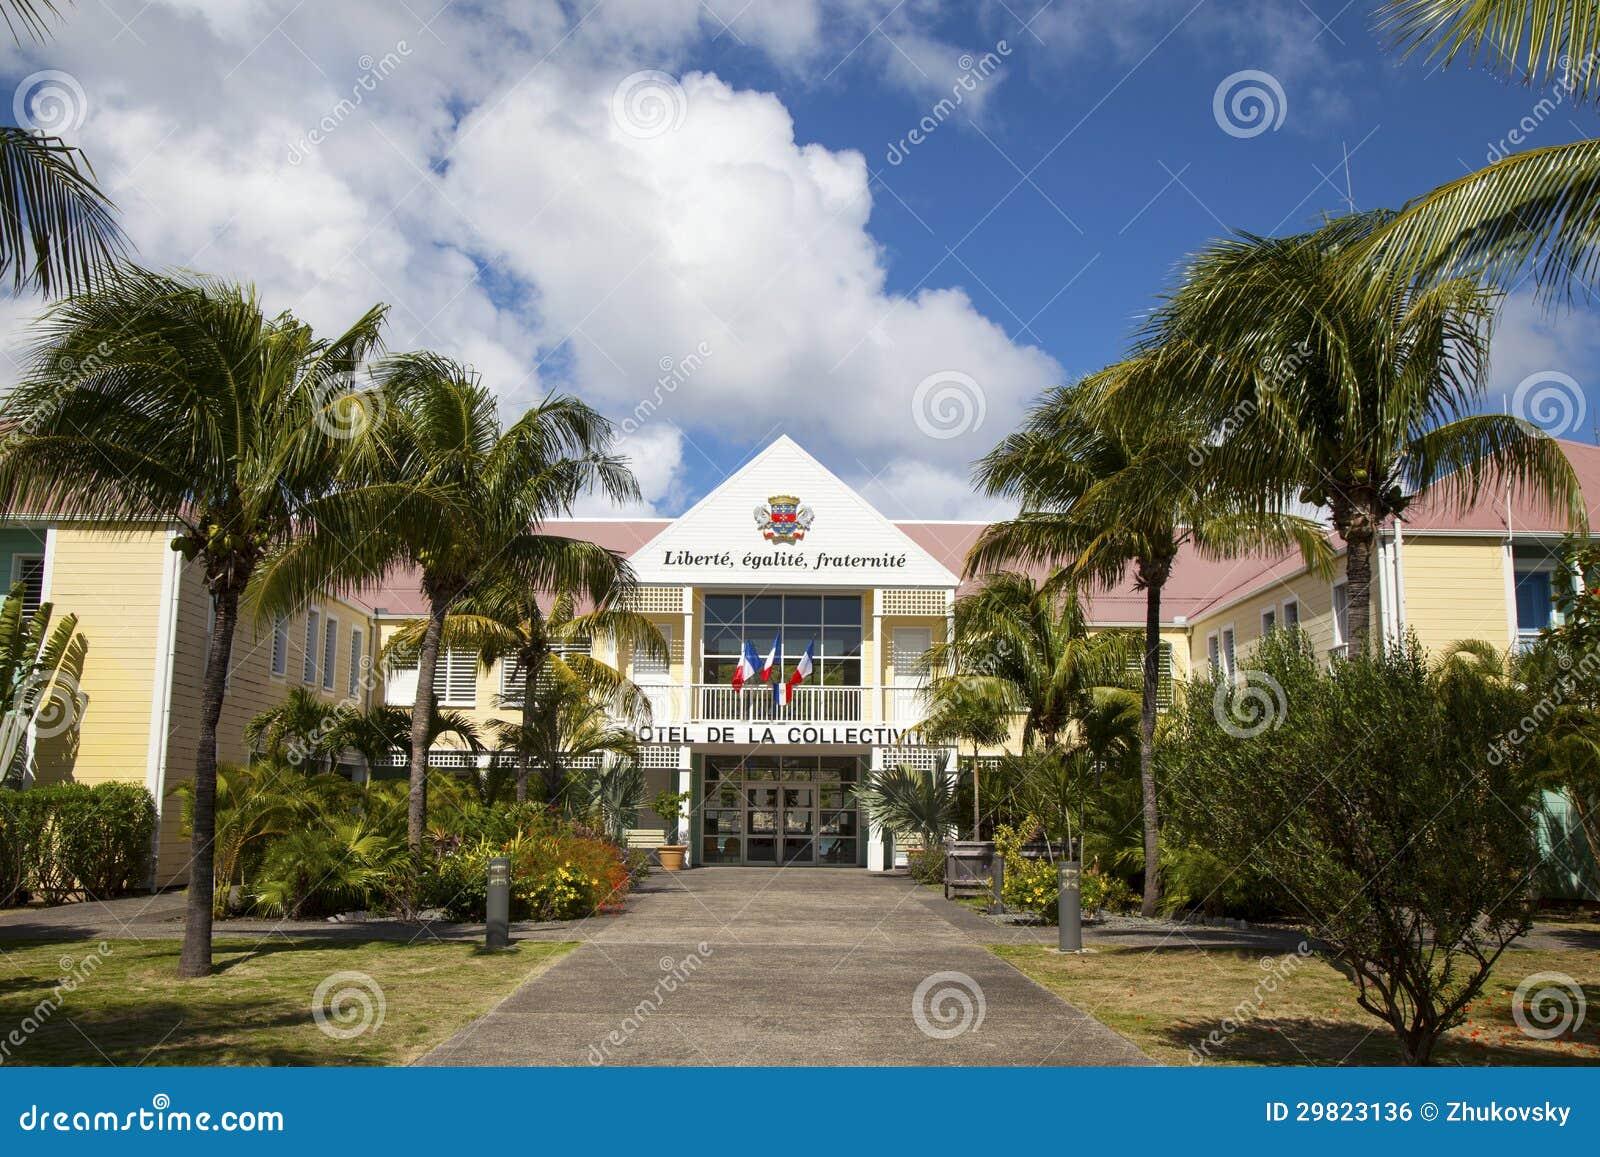 Hotel DE La Collective, vroeger Stadhuis bij St Barth, de Franse Antillen.